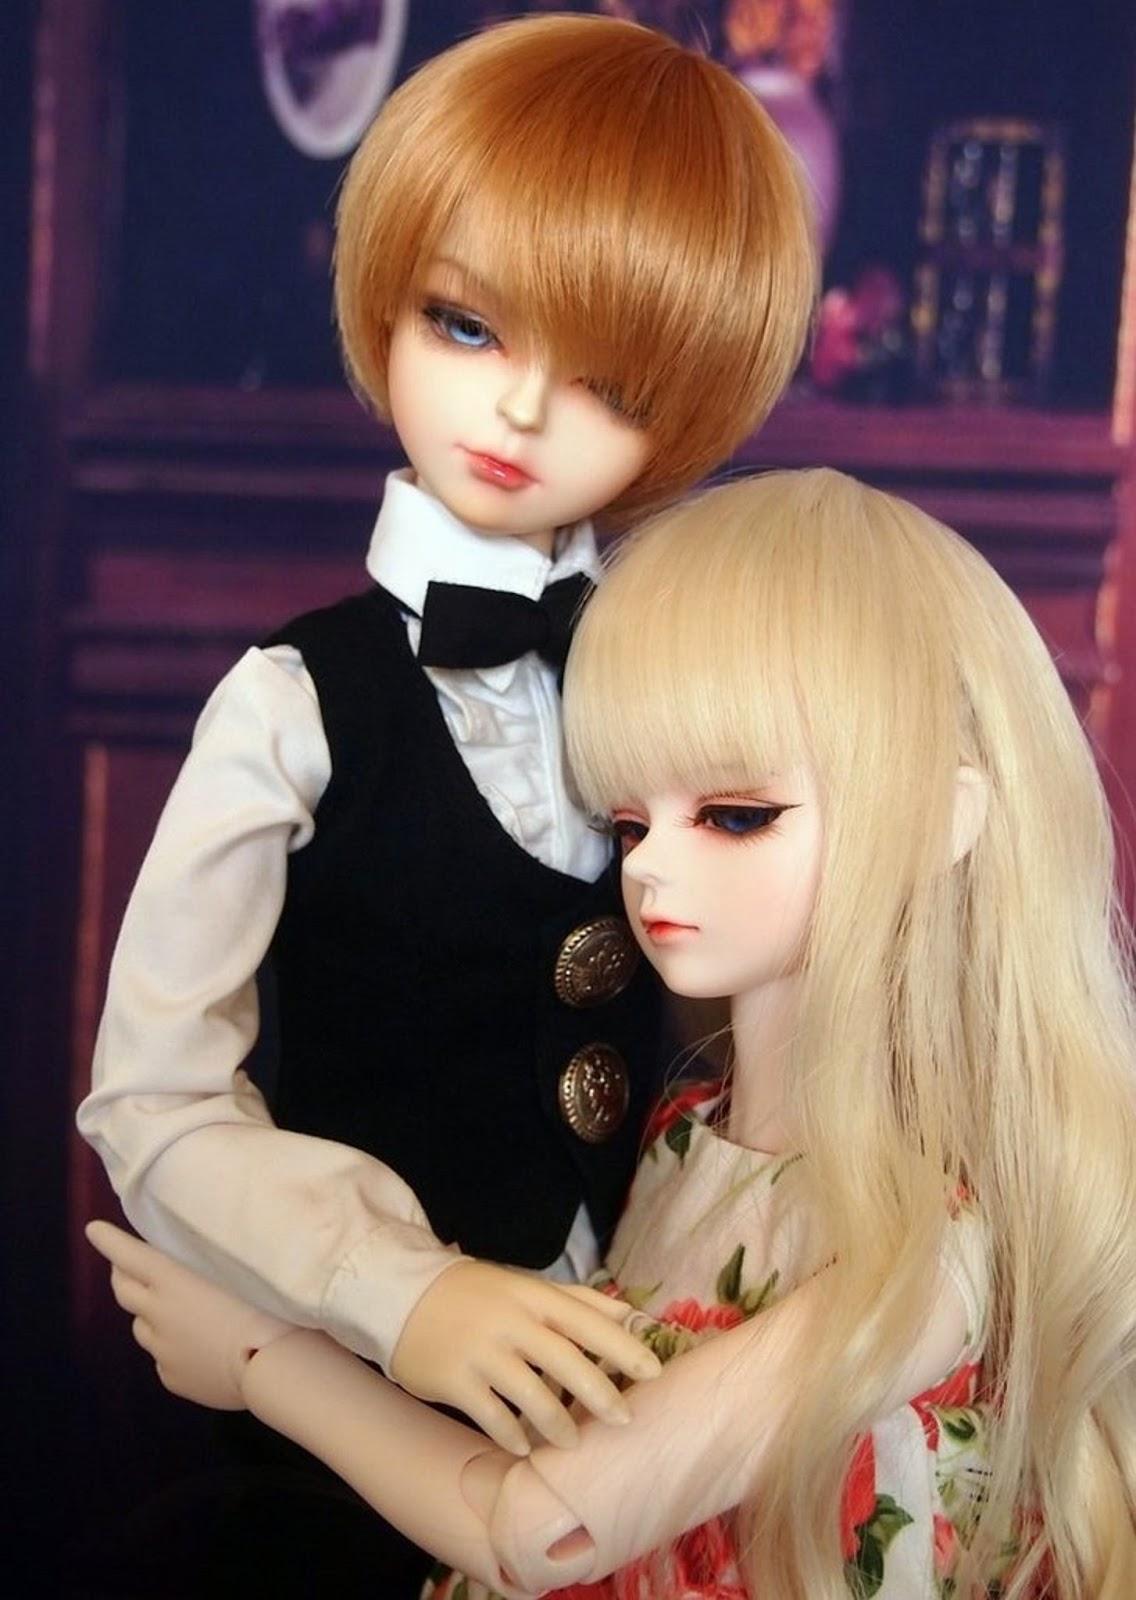 Fantastic Wallpaper Love Barbie - sweet-romantic-love-couple-barbie-doll-wallpapers%2B%25282%2529  Snapshot_557511.jpg